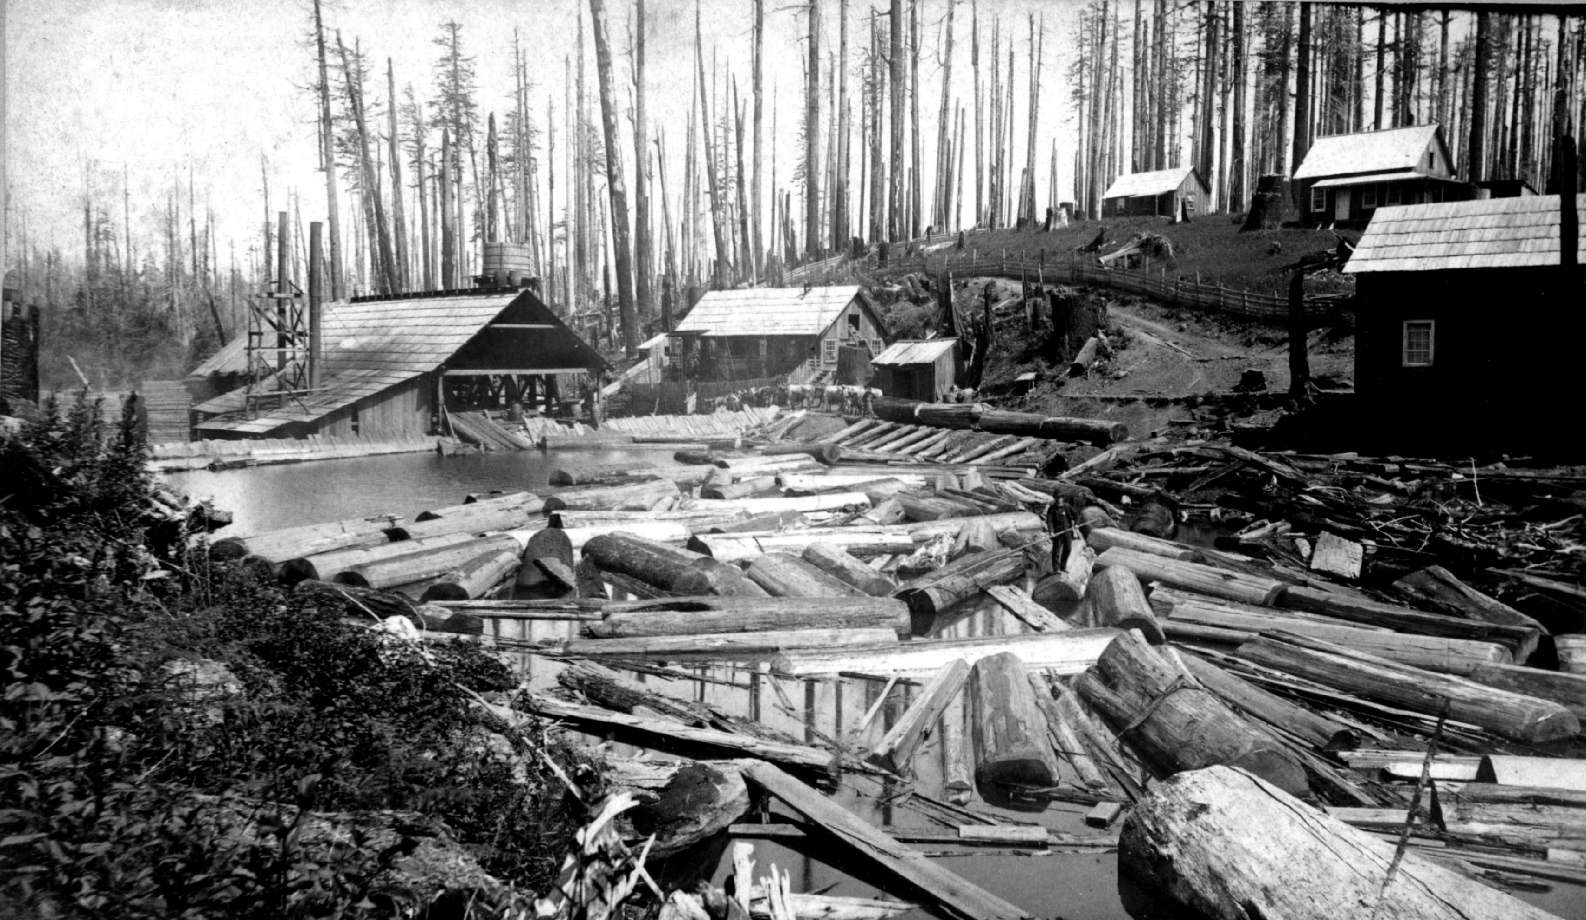 Rainier, Oregon - Charles R  Wilson & Co  Saw Mill